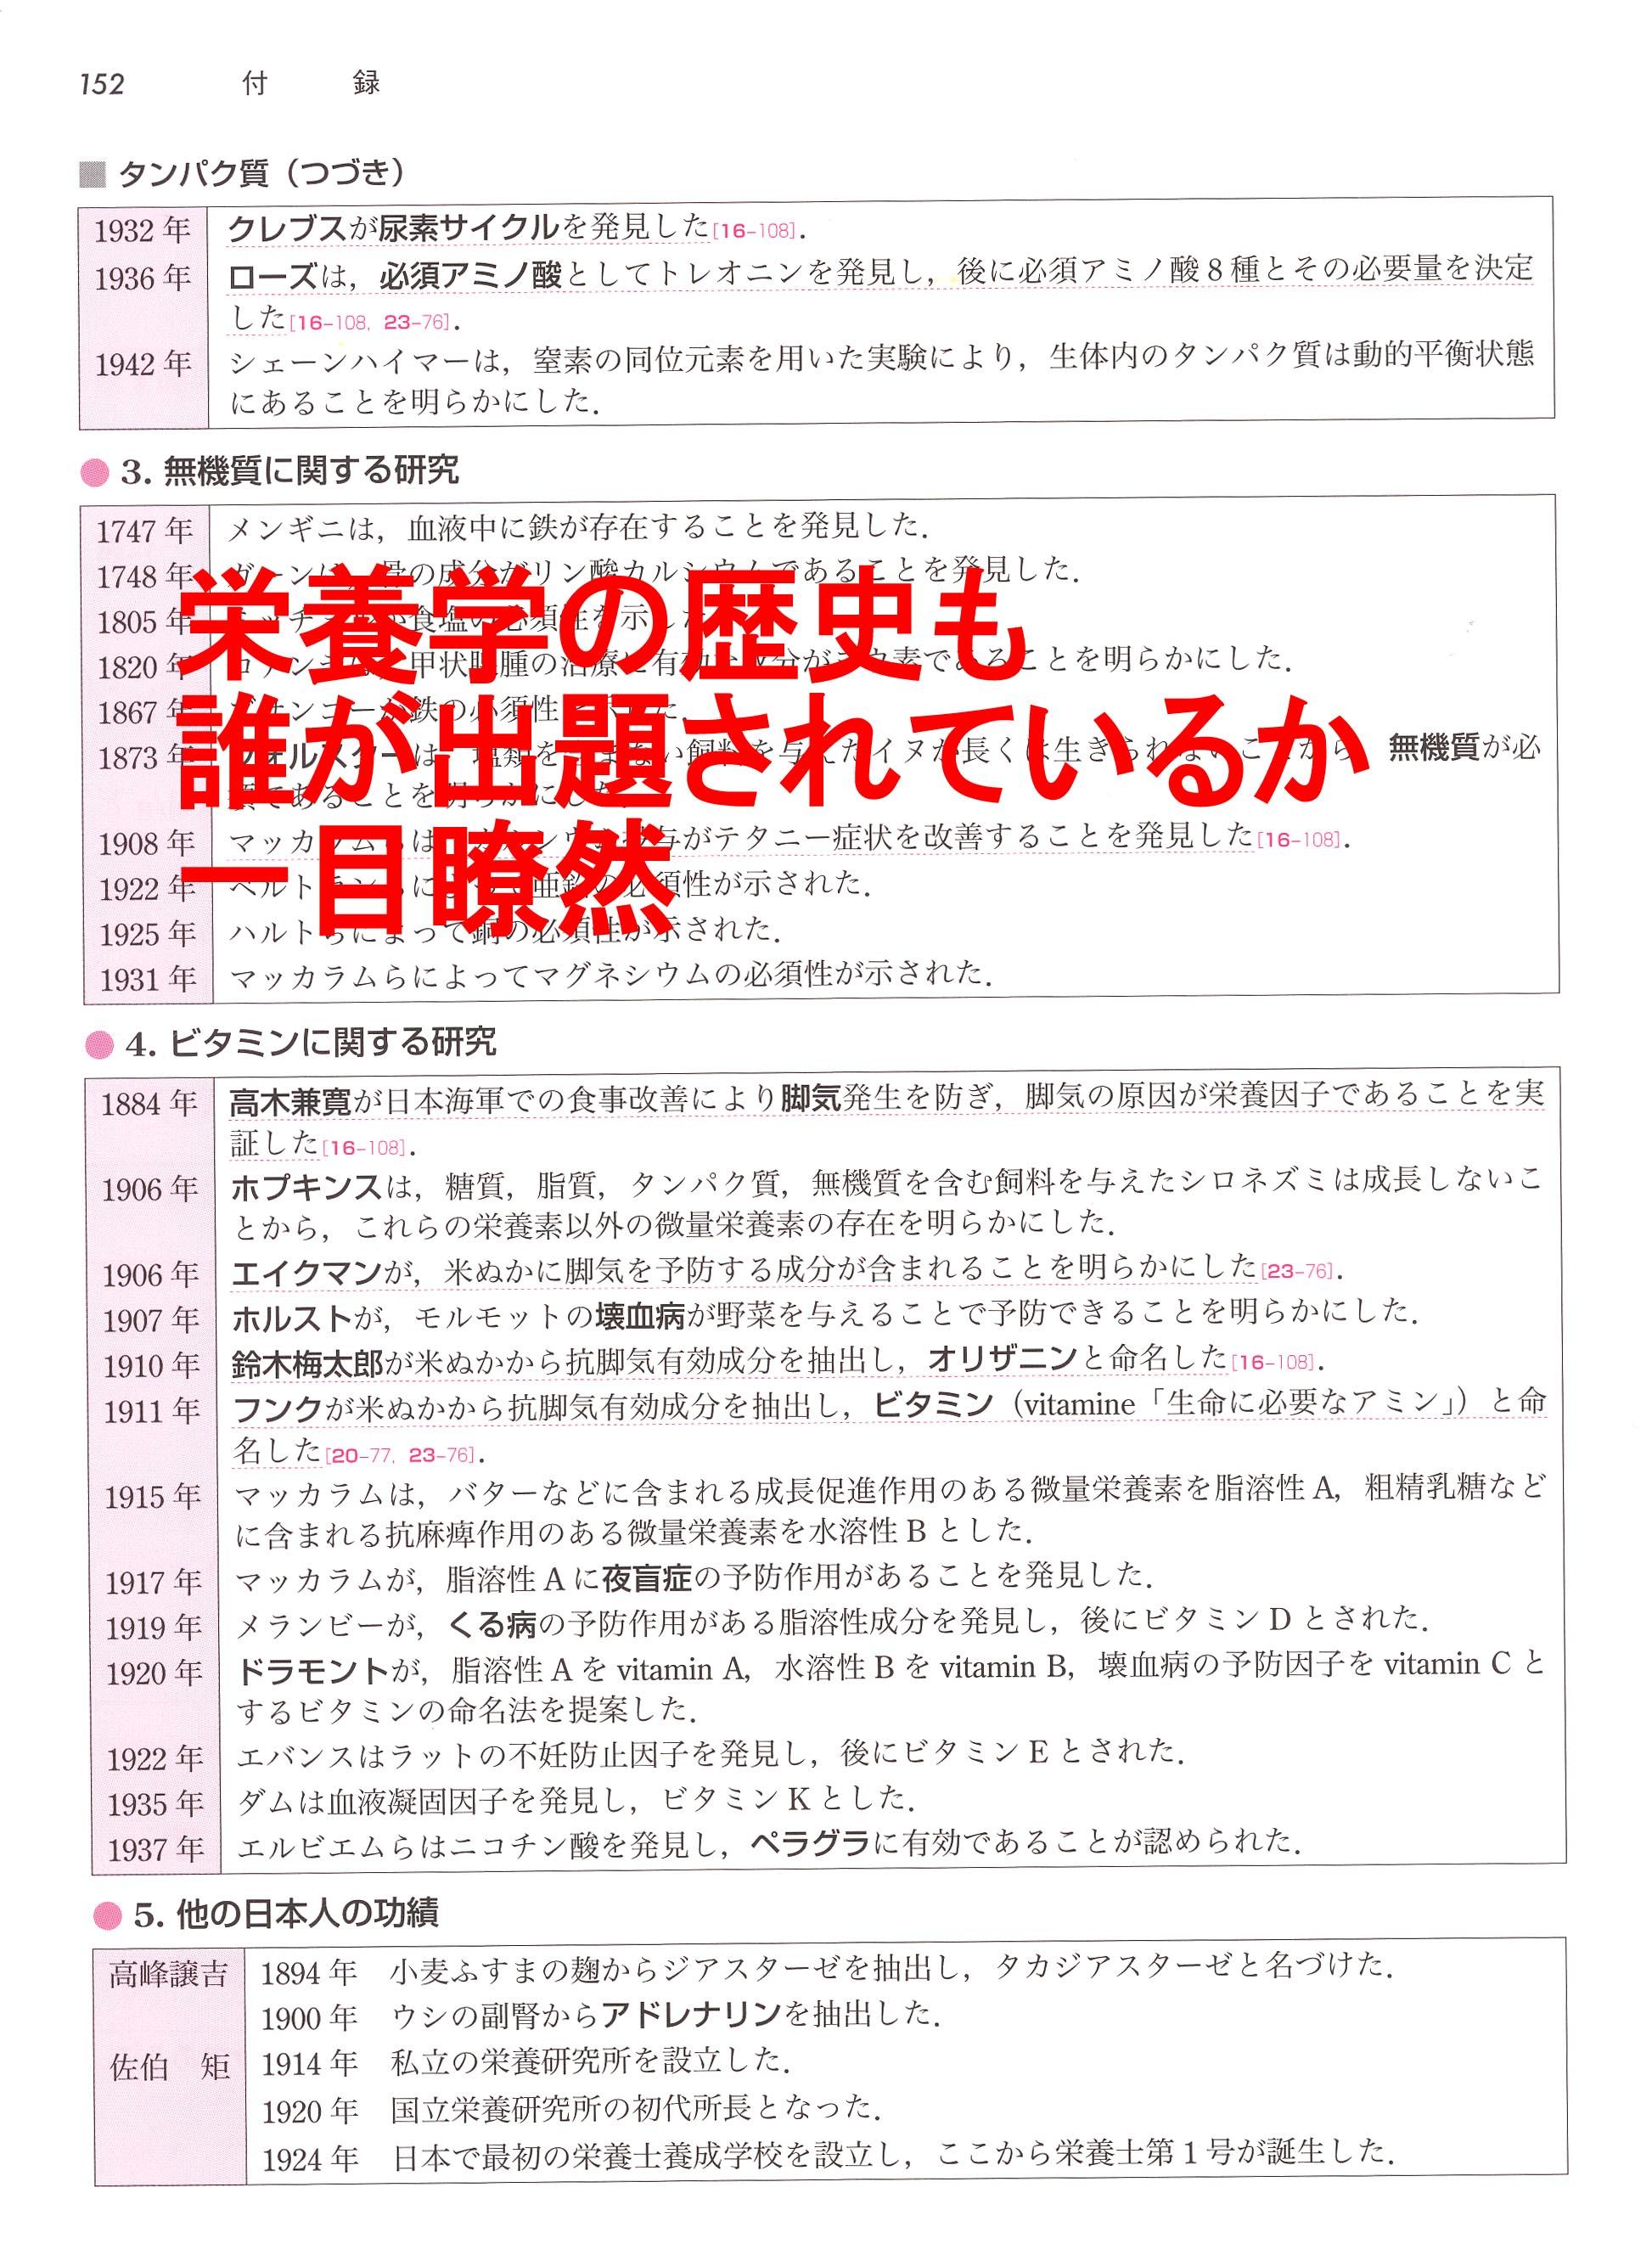 http://nutr.food.sugiyama-u.ac.jp/blog/006/images/asakura21.jpg